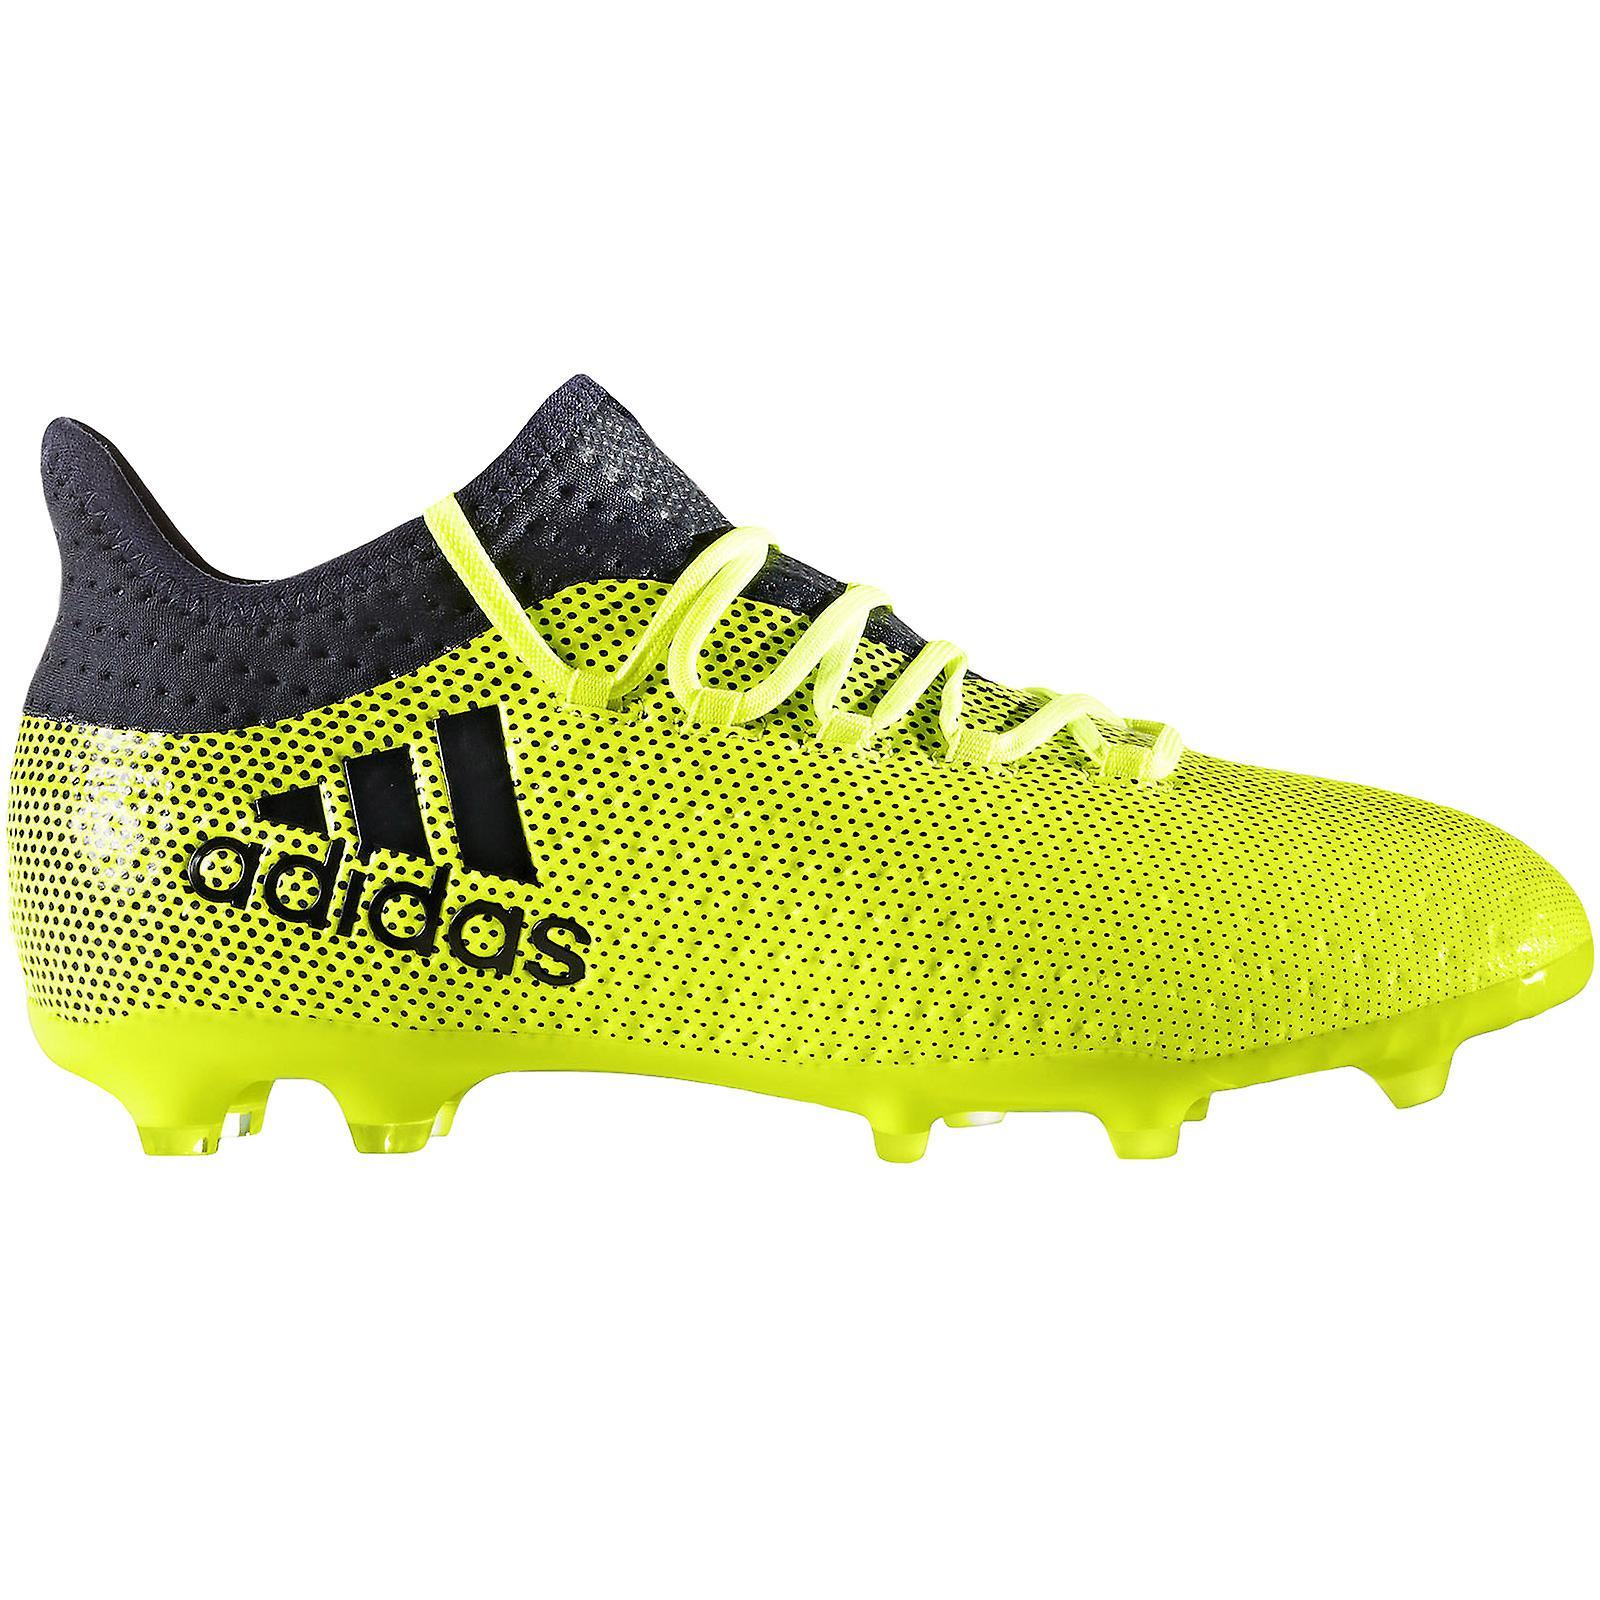 Adidas Performance Kids X 17,1 Firm bakken fotball sport trening støvler gul